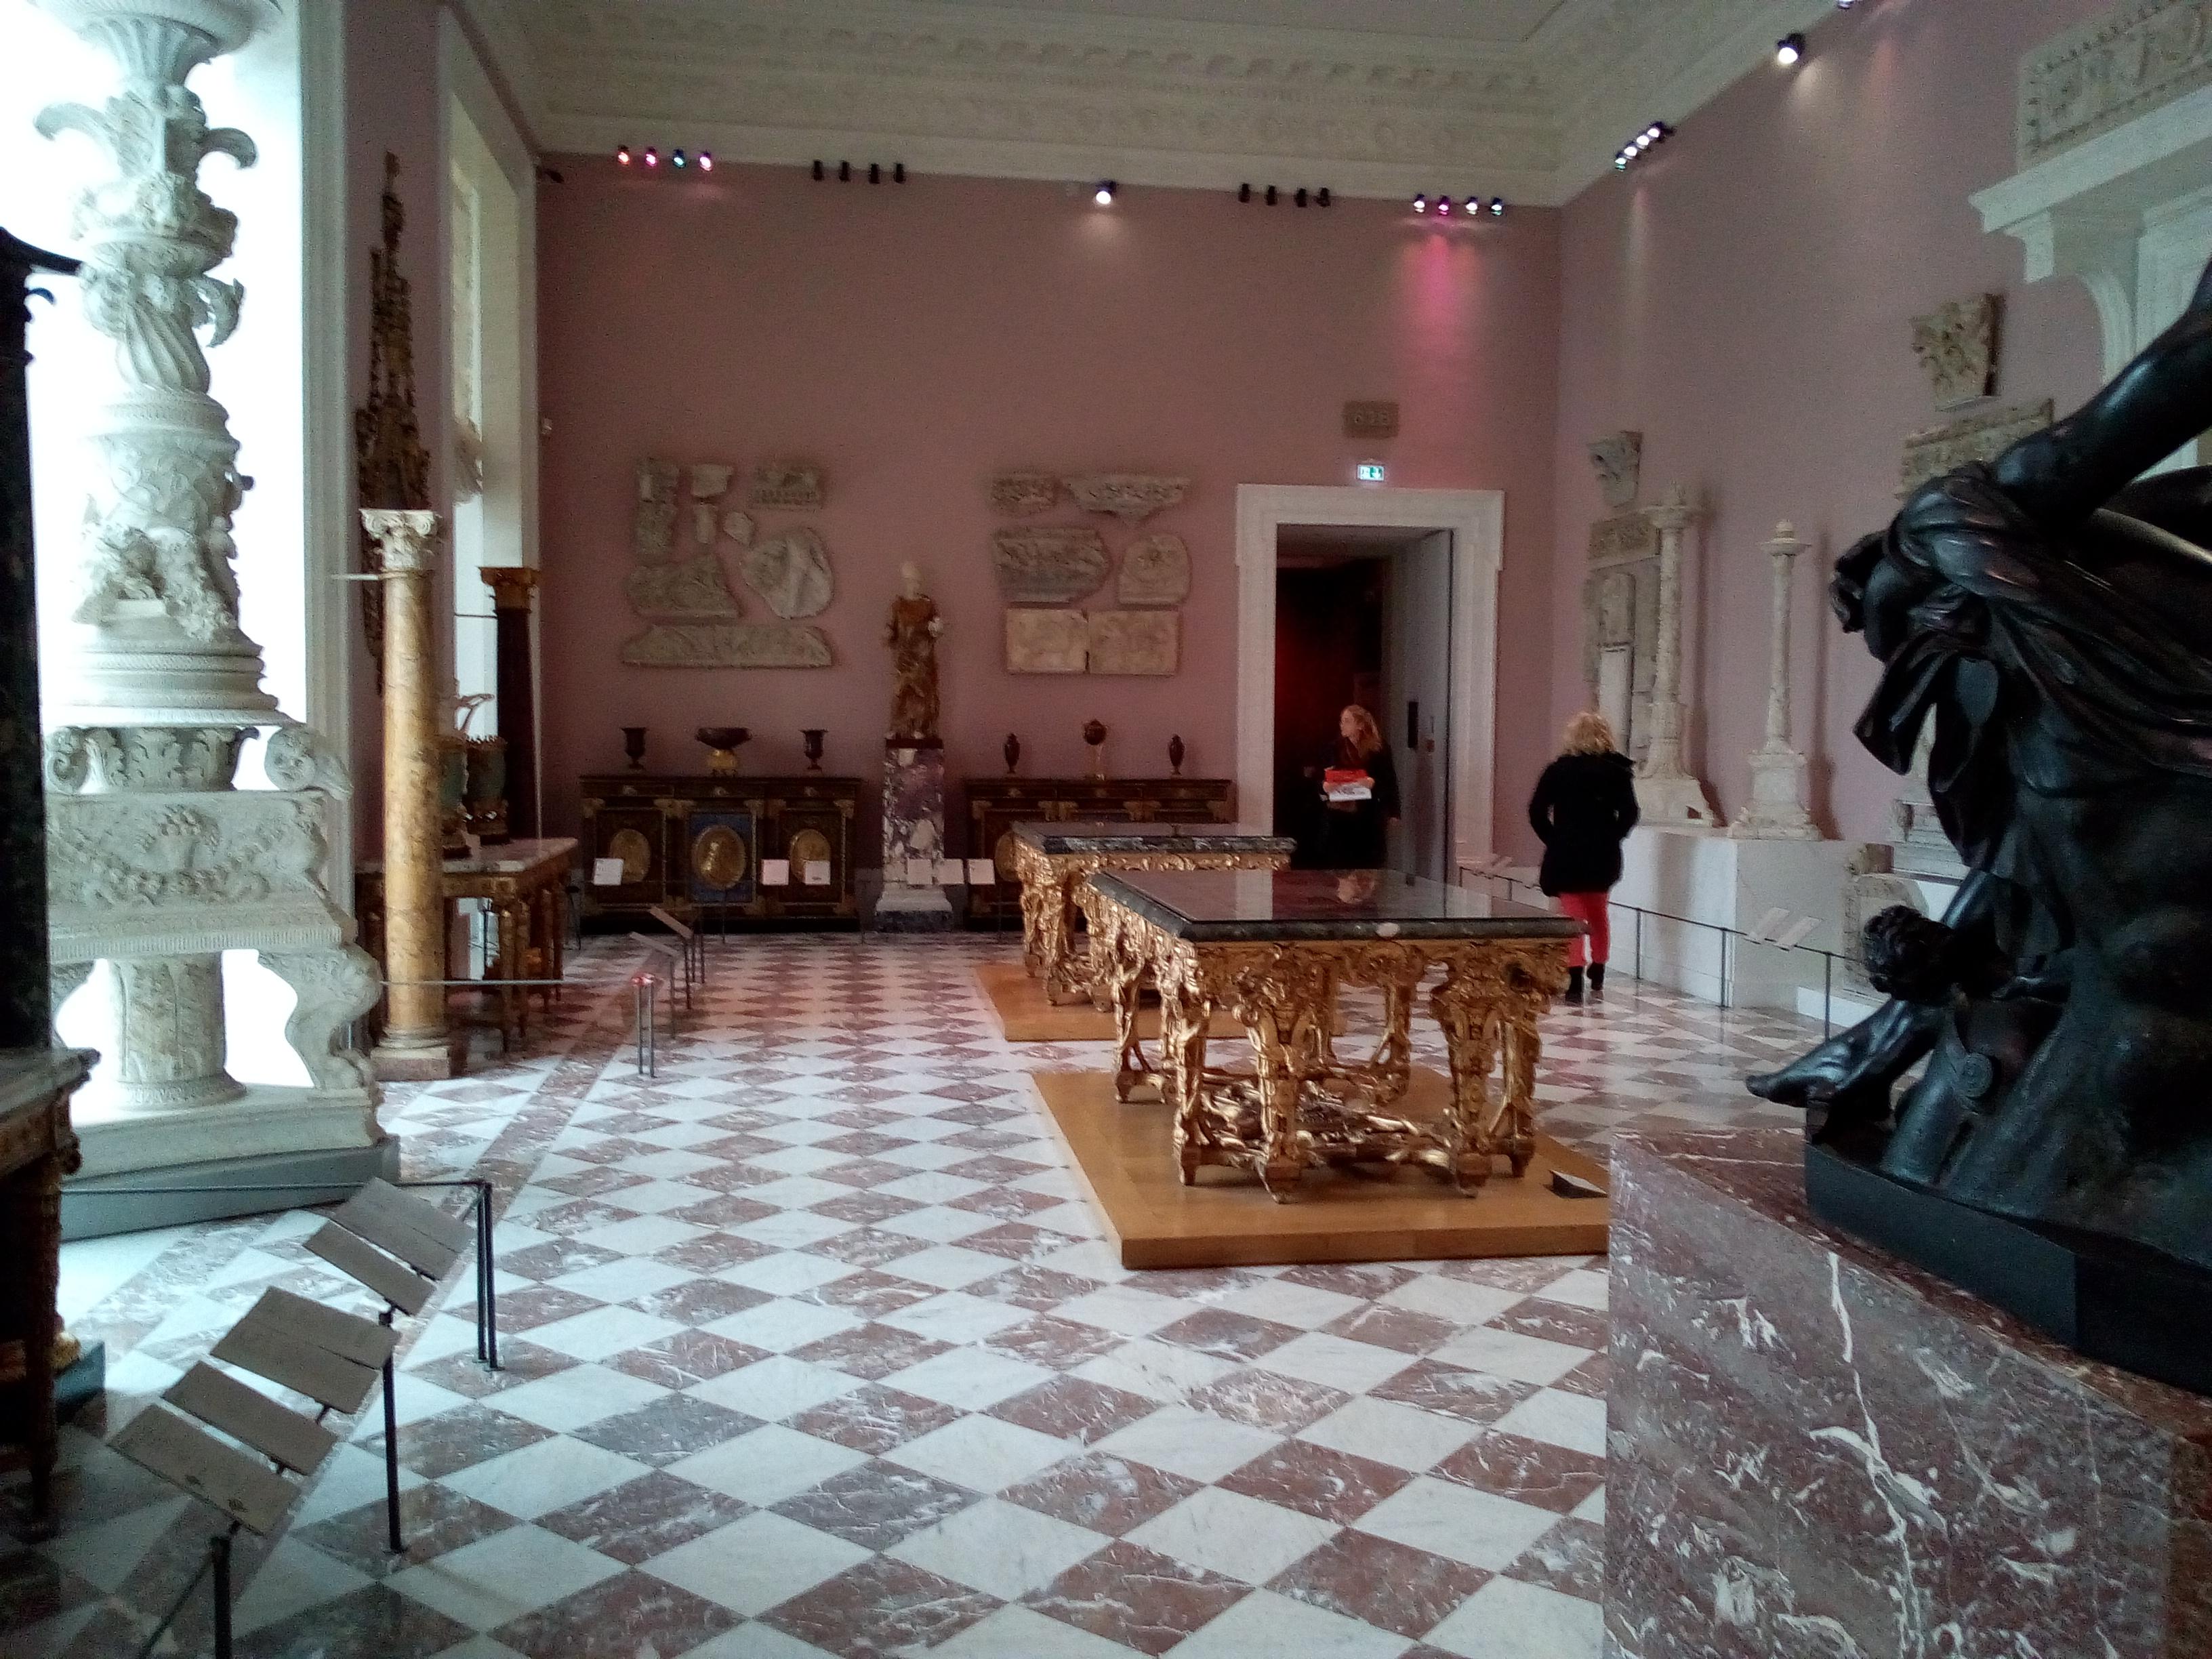 Salle Piranèse Louvre